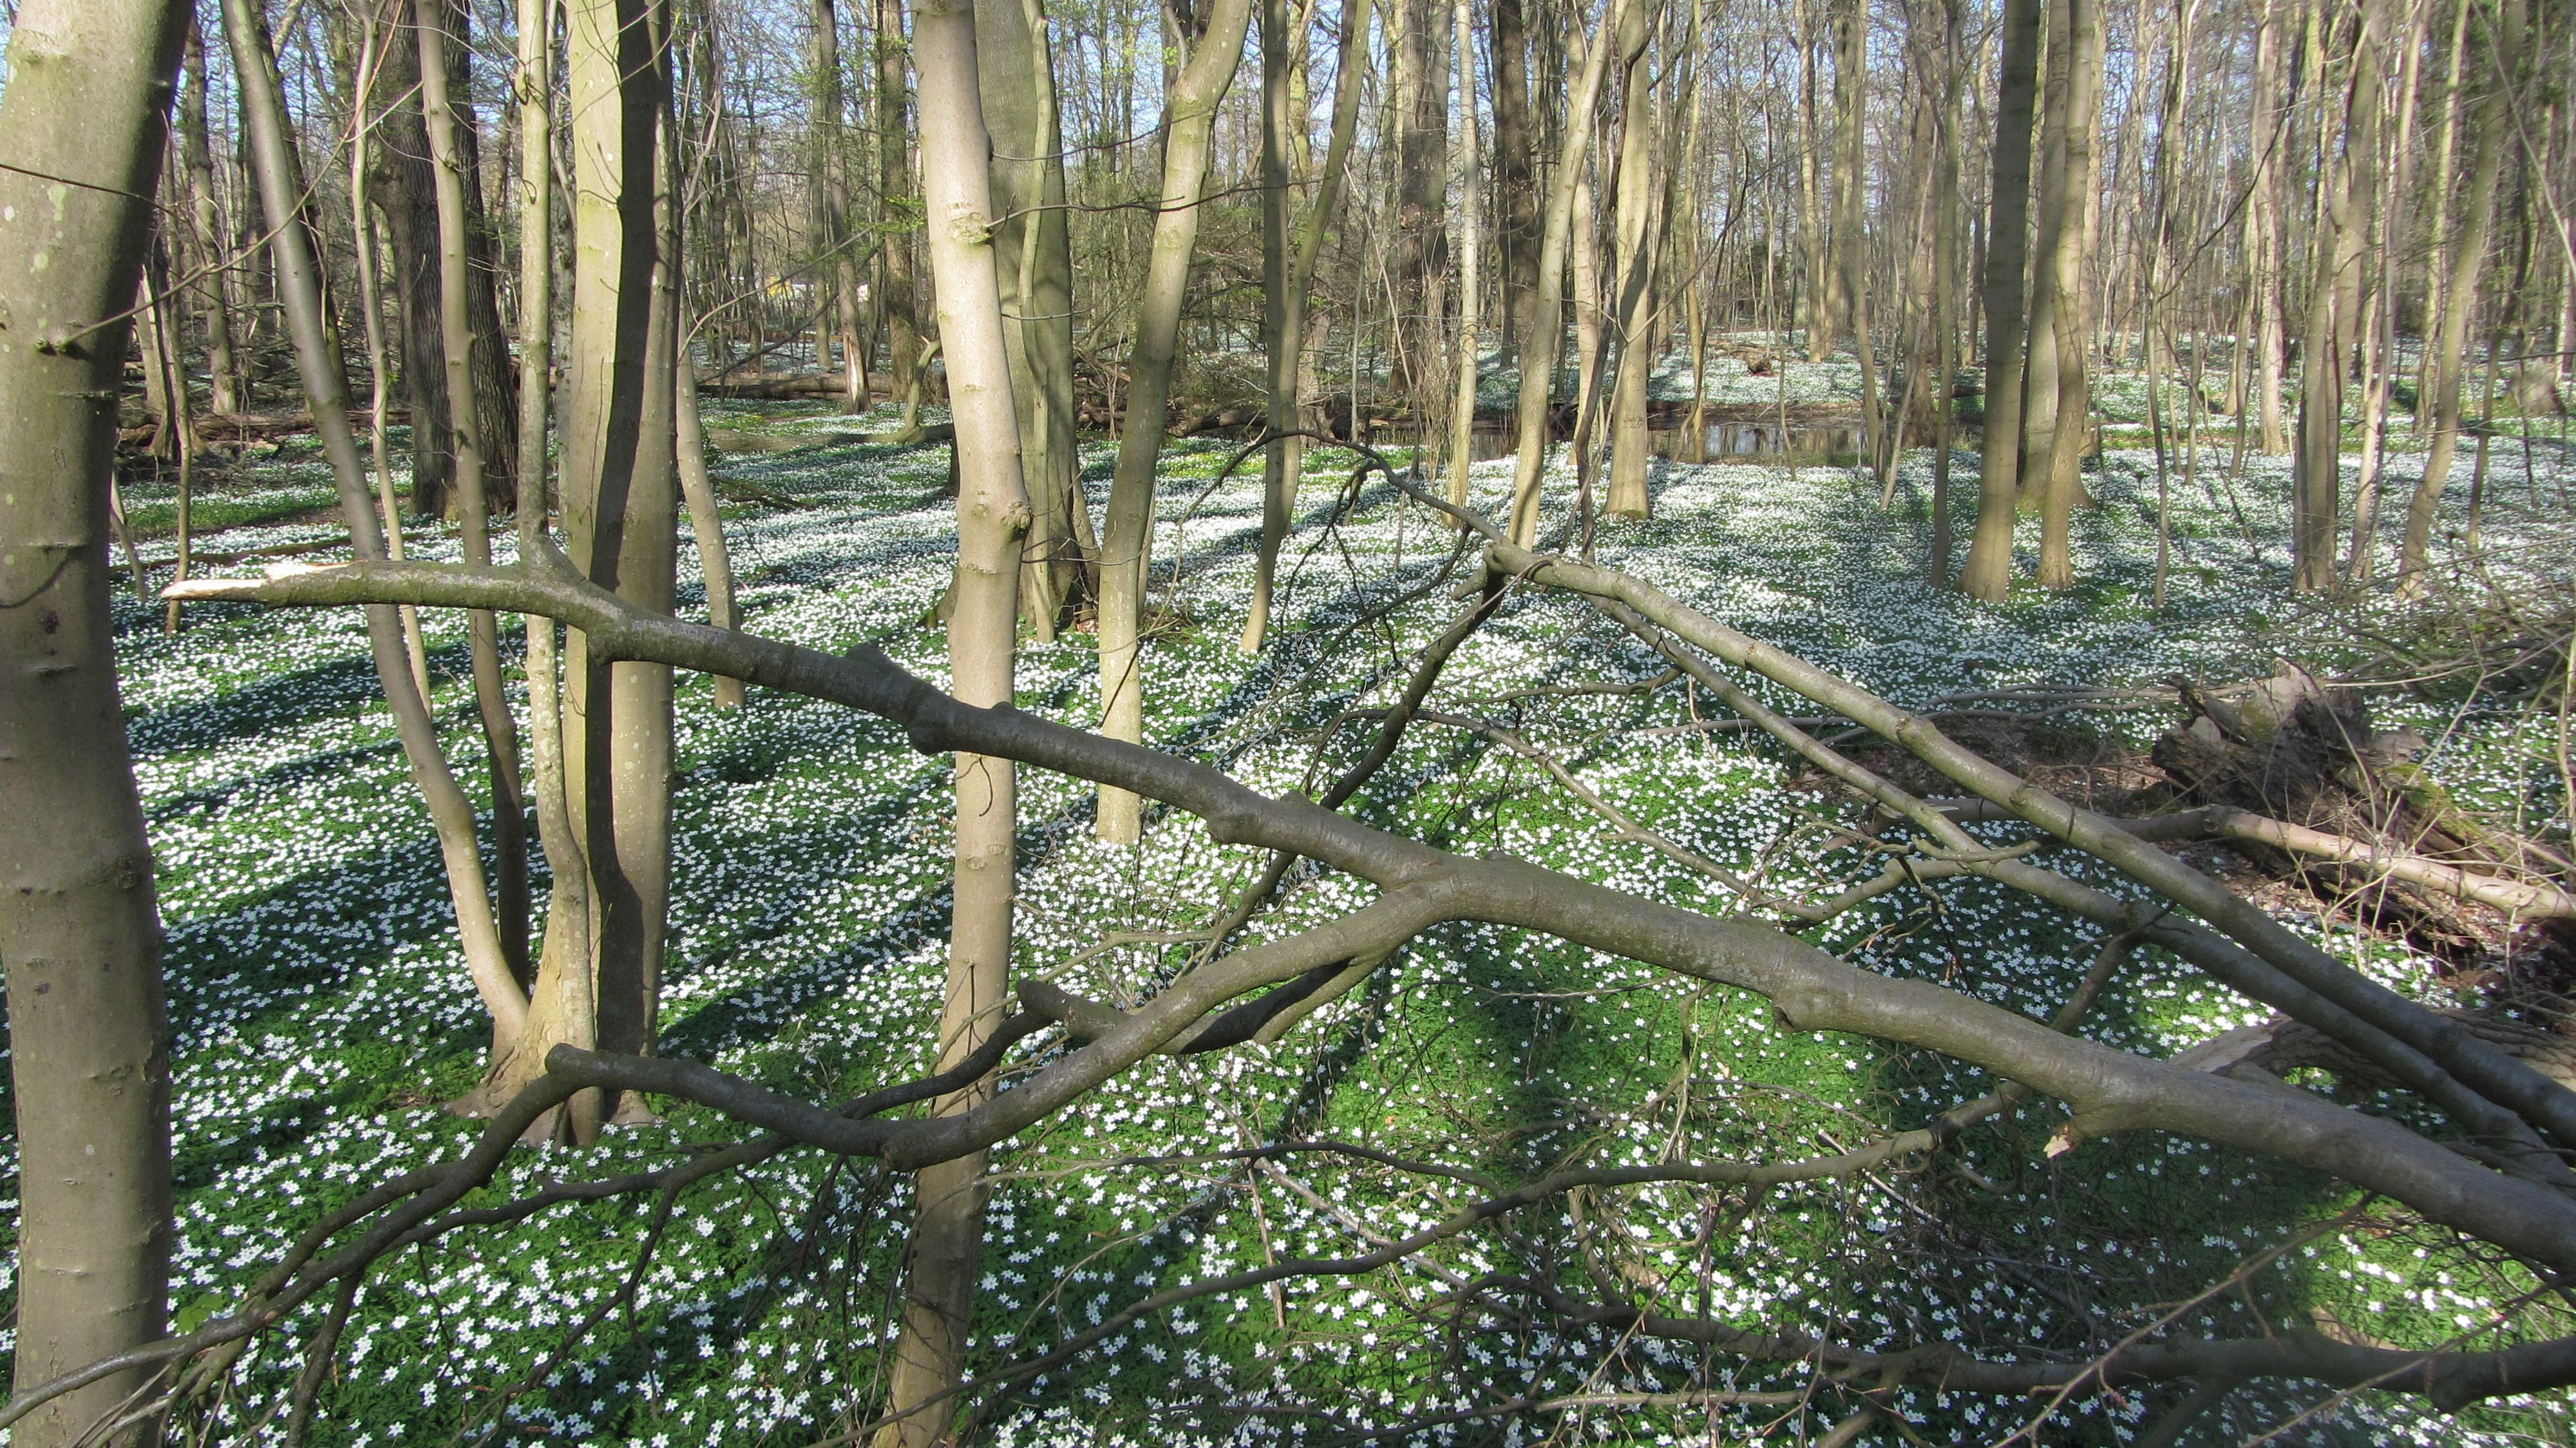 Beautiful Naturschutzgebiet Eldena Elisenhain in Greifswald Mecklenburg Vorpommern